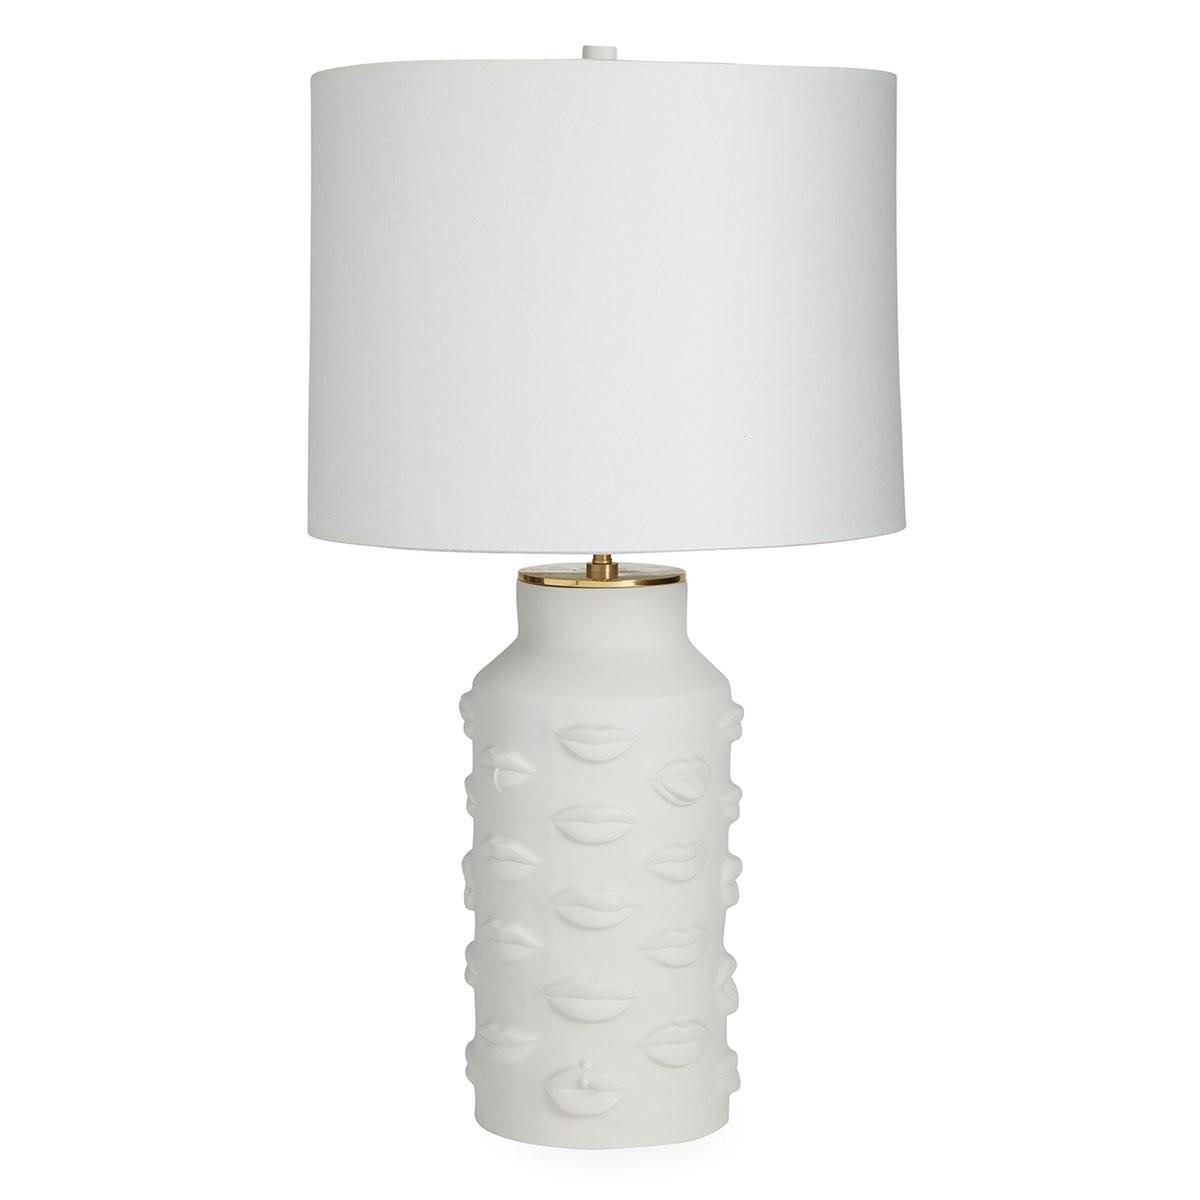 Jonathan Adler I Gala Lips Table Lamp